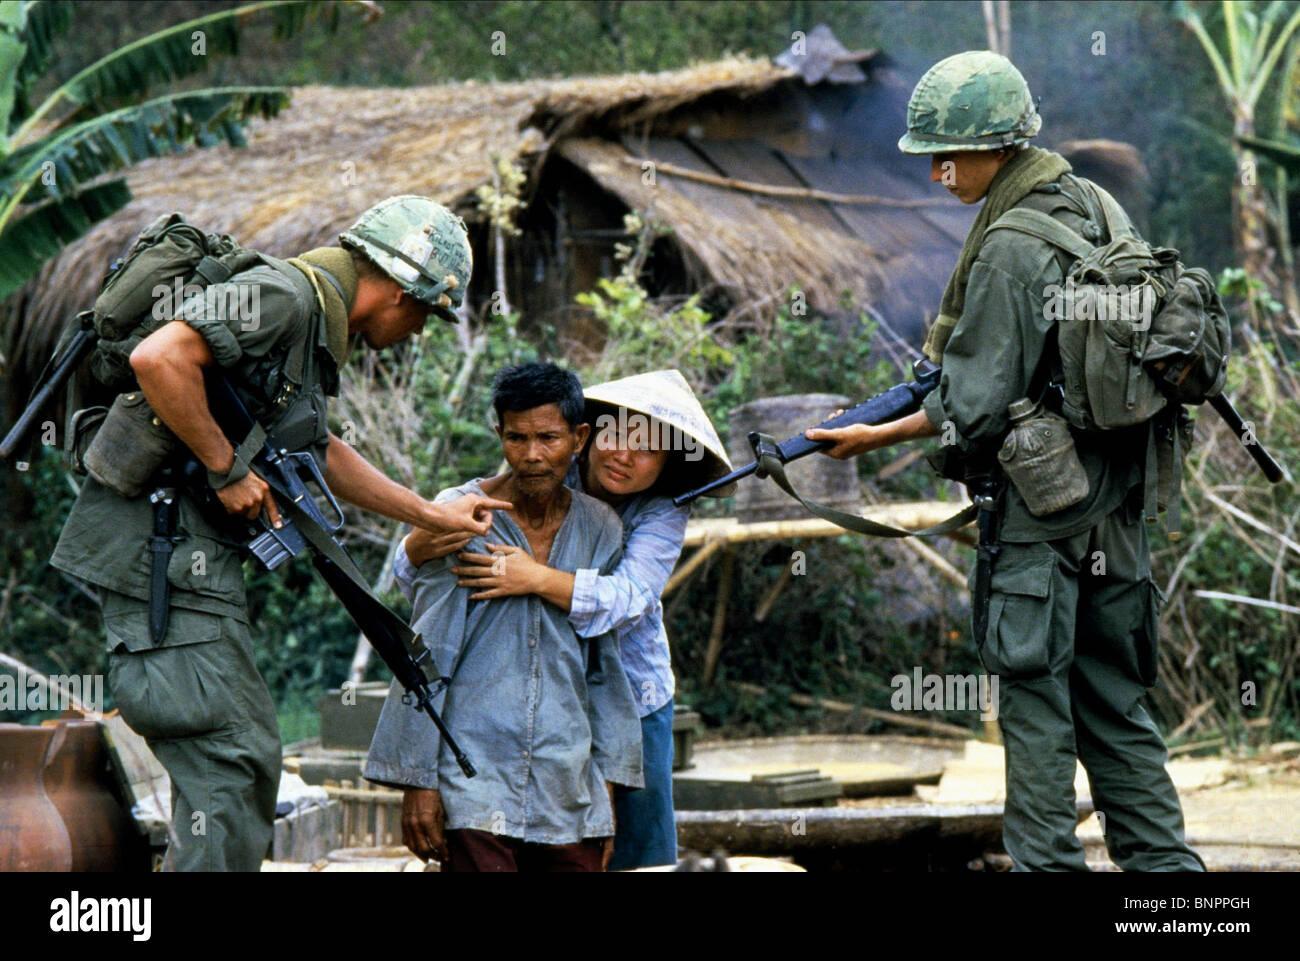 Vietnam War Scene Platoon 1986 Stock Photos & Vietnam War